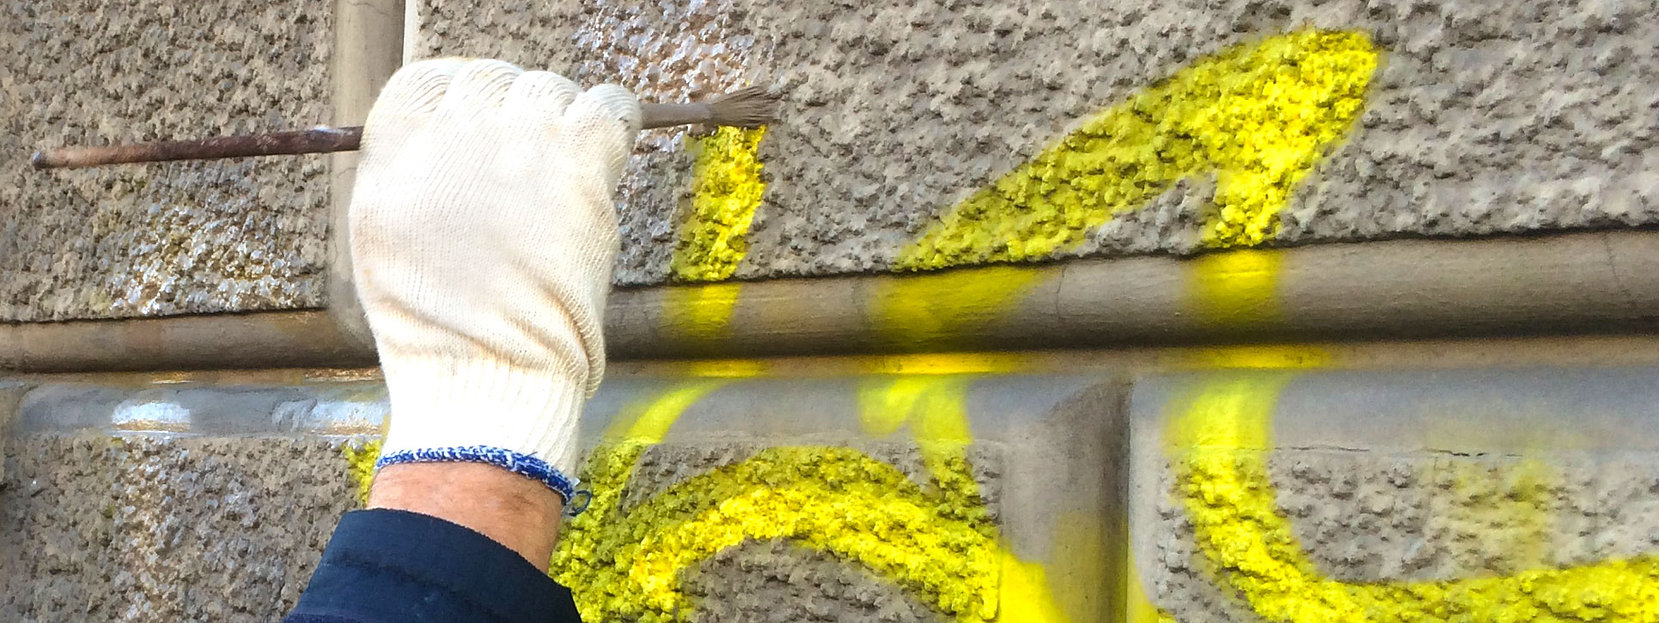 abbonamento_graffito_giallo.jpg